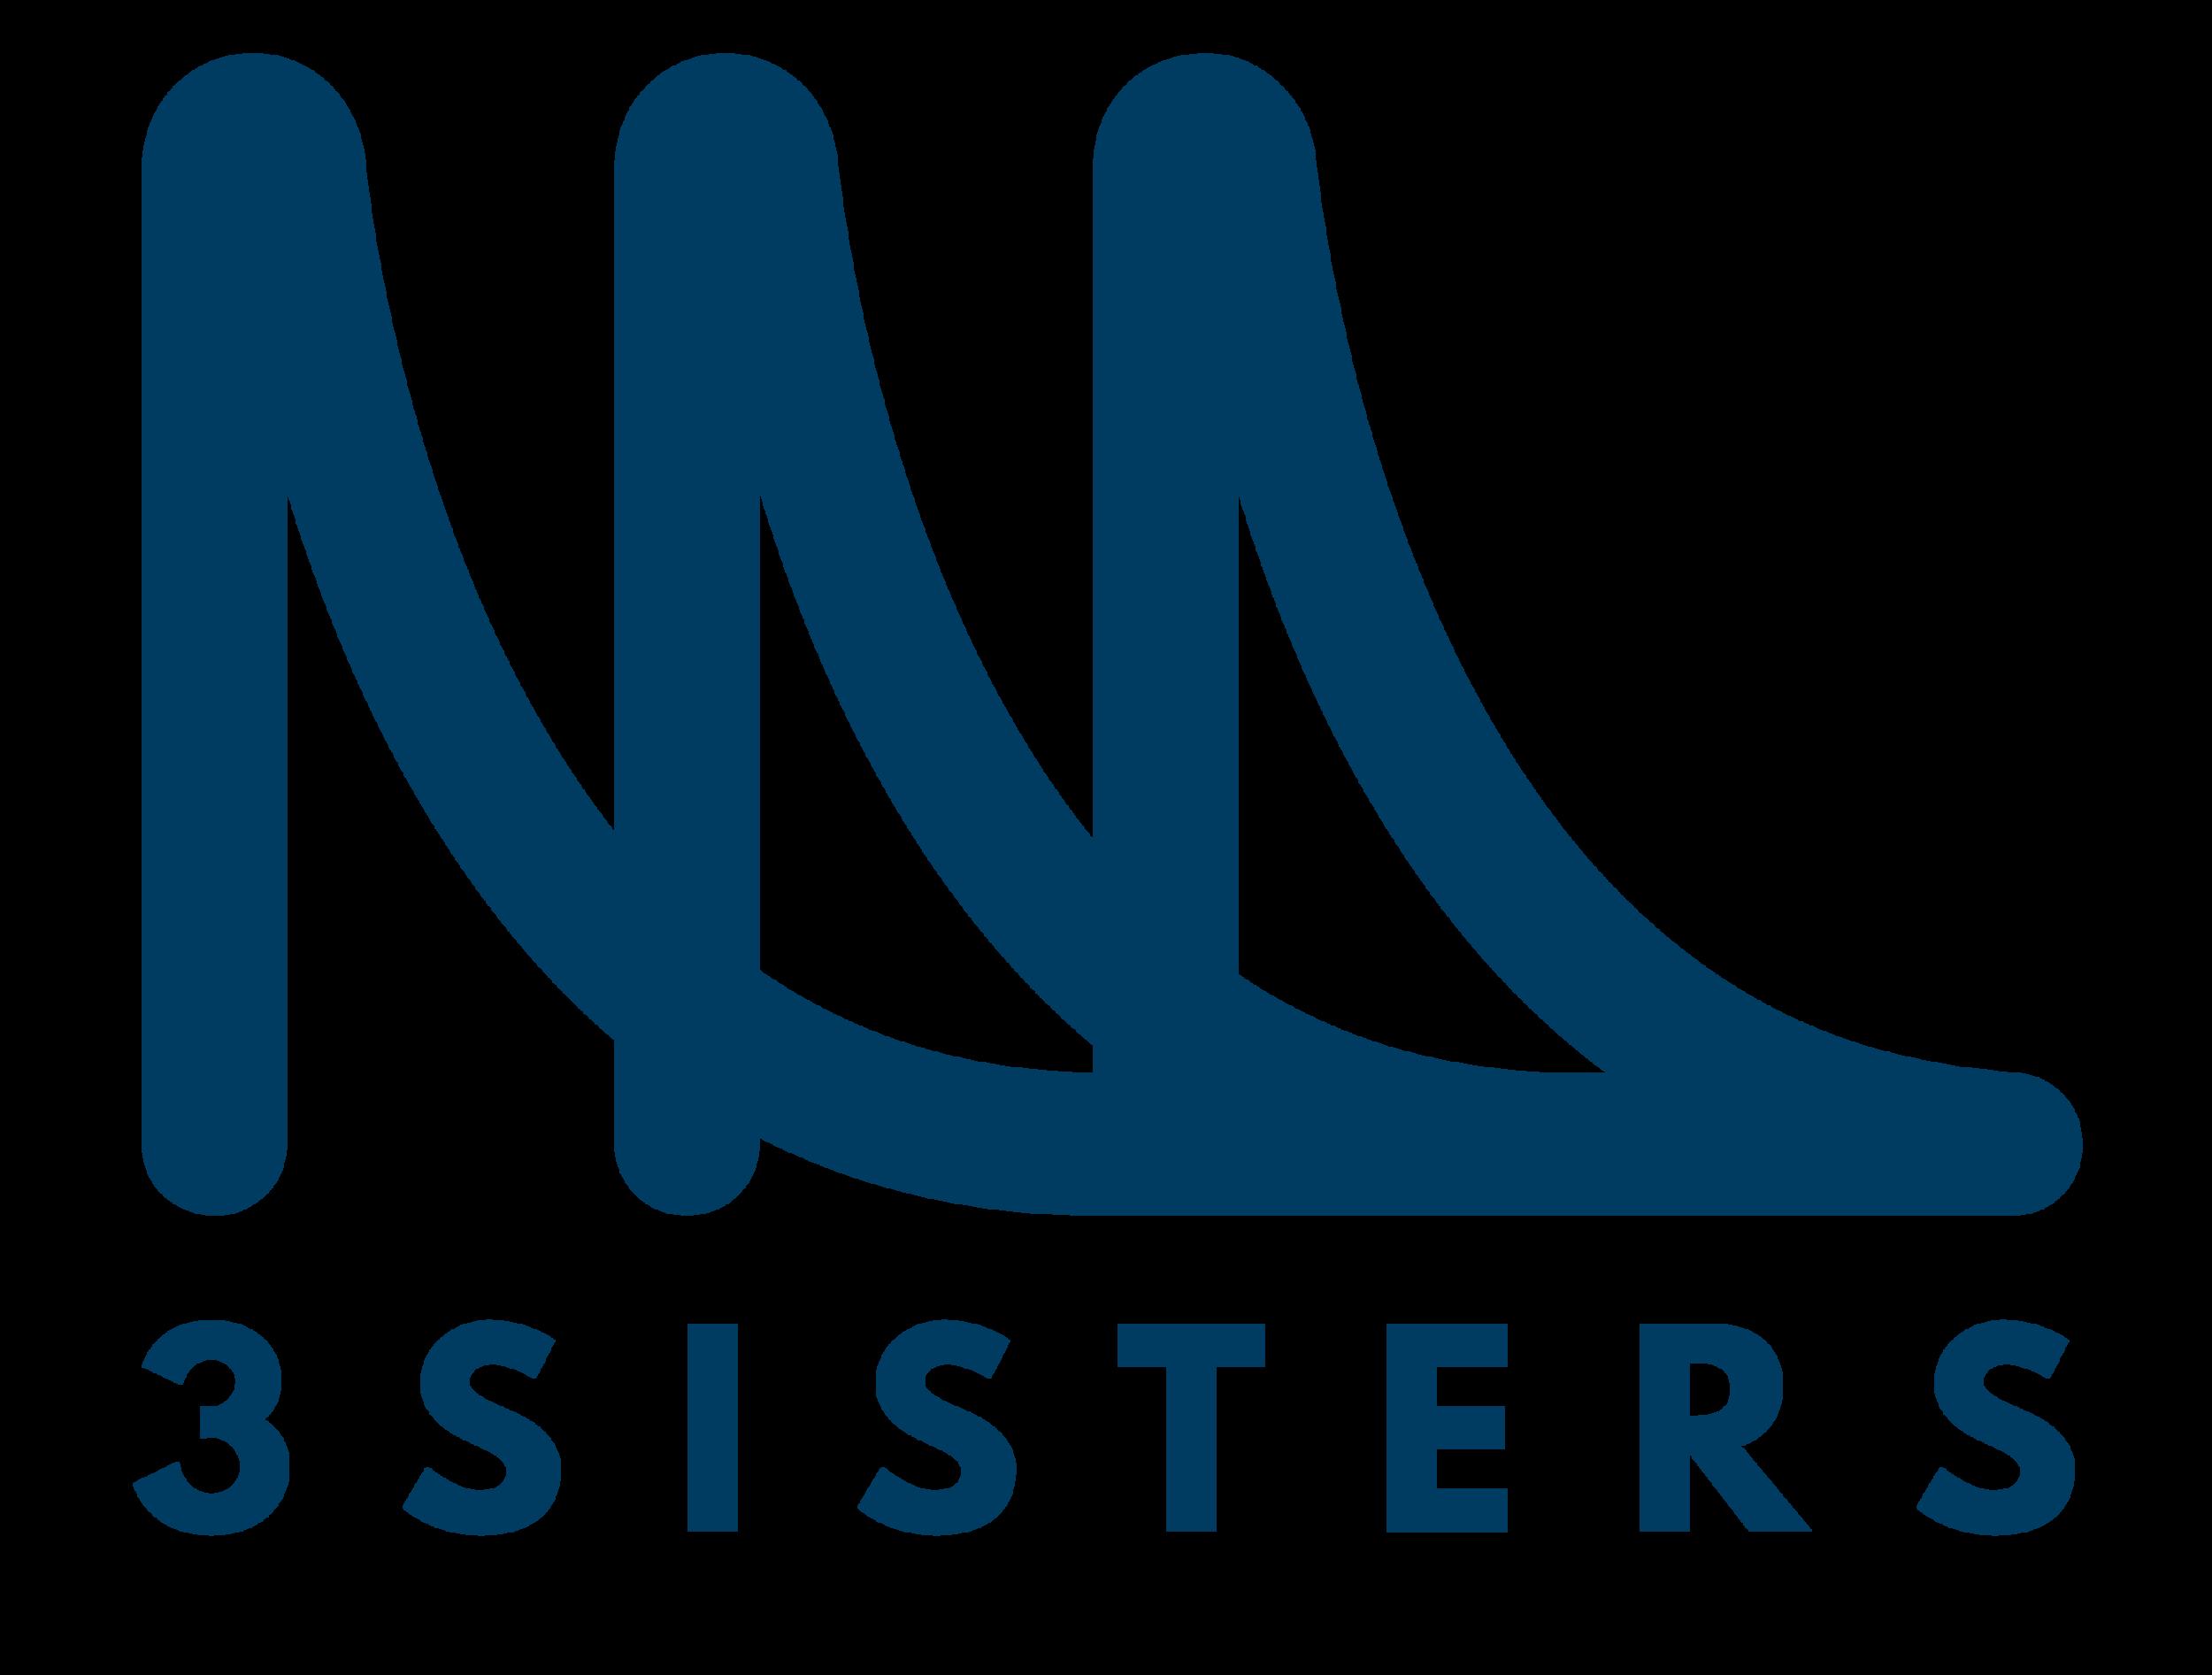 3sisters_logo-07.png